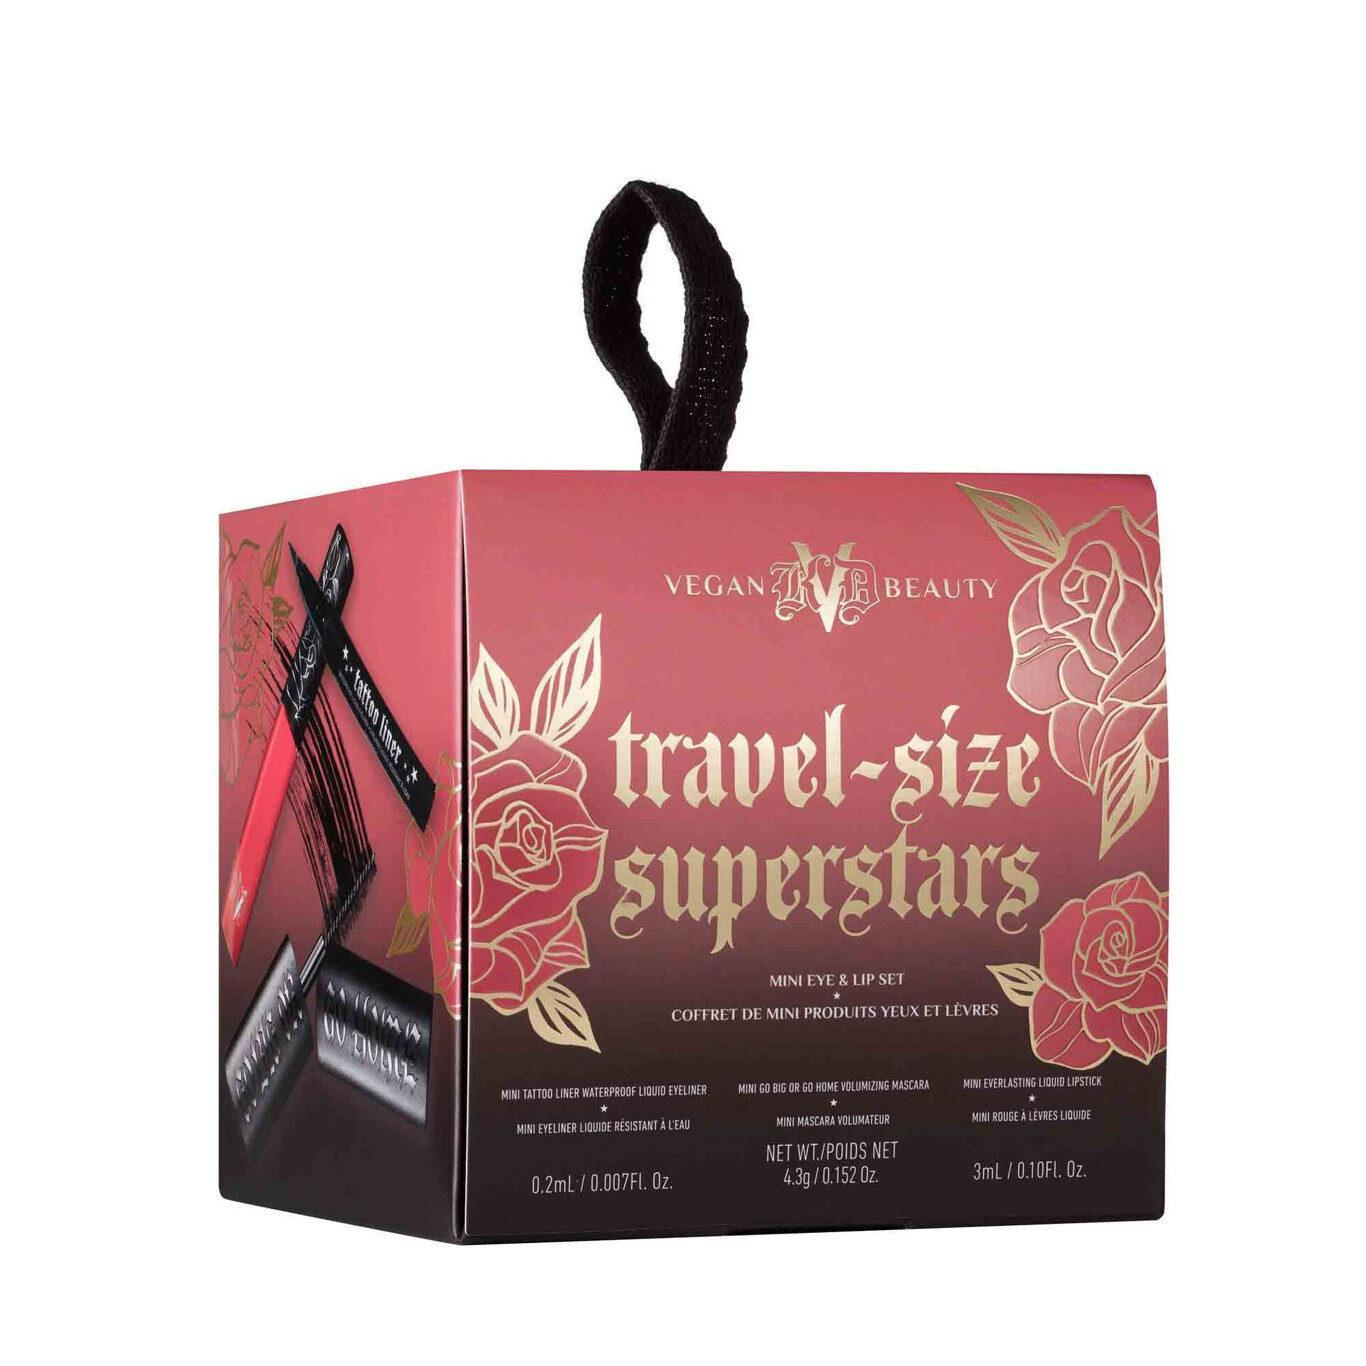 KVD Vegan Beauty Holiday Collection 2020 Travel Size Superstars Mini Eye & Lip Set BOX